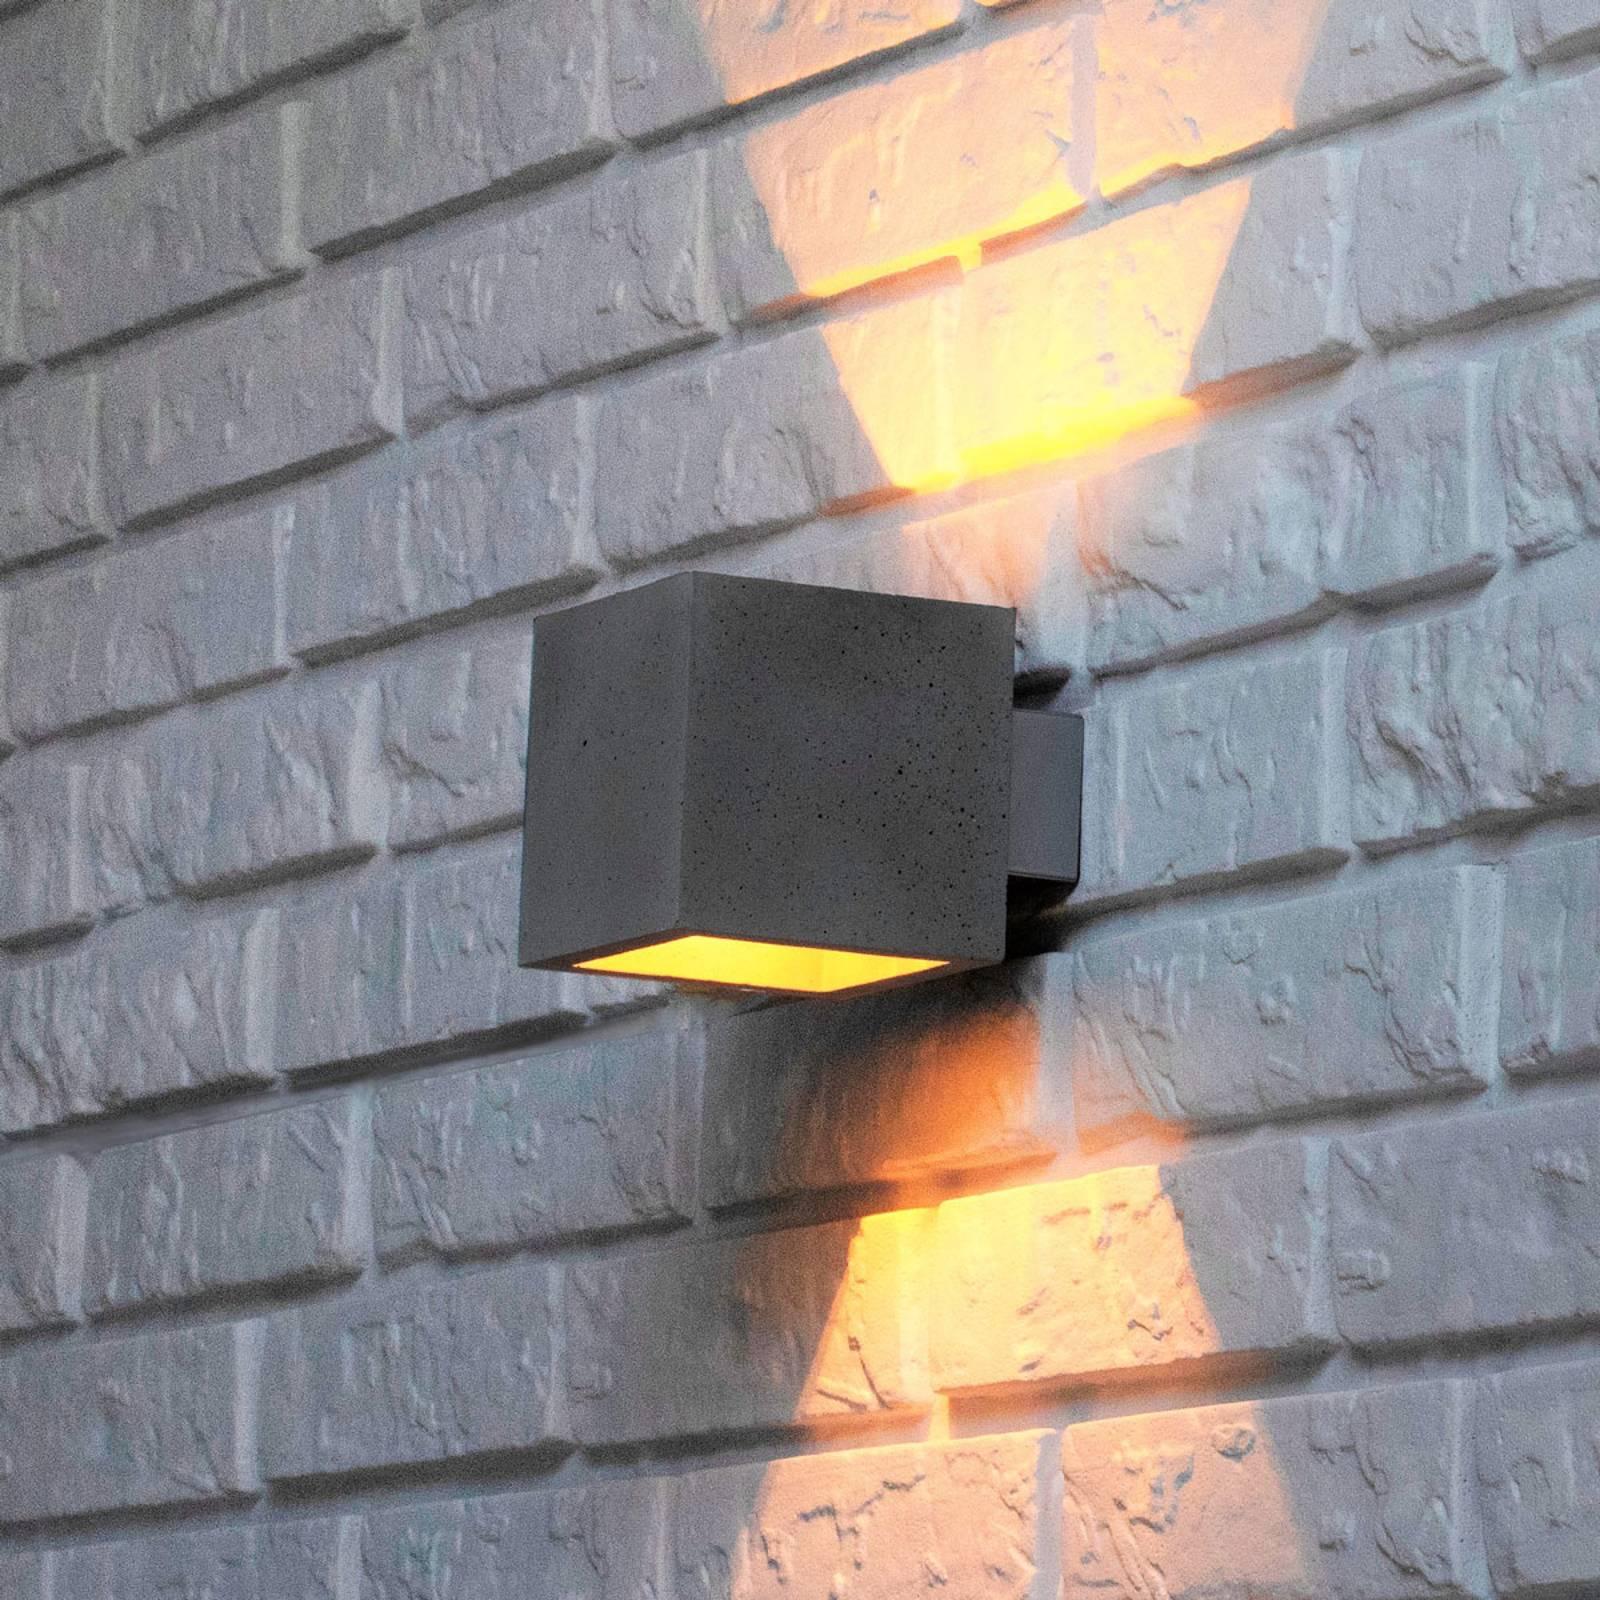 badlampen von spot light und andere lampen f r badezimmer. Black Bedroom Furniture Sets. Home Design Ideas